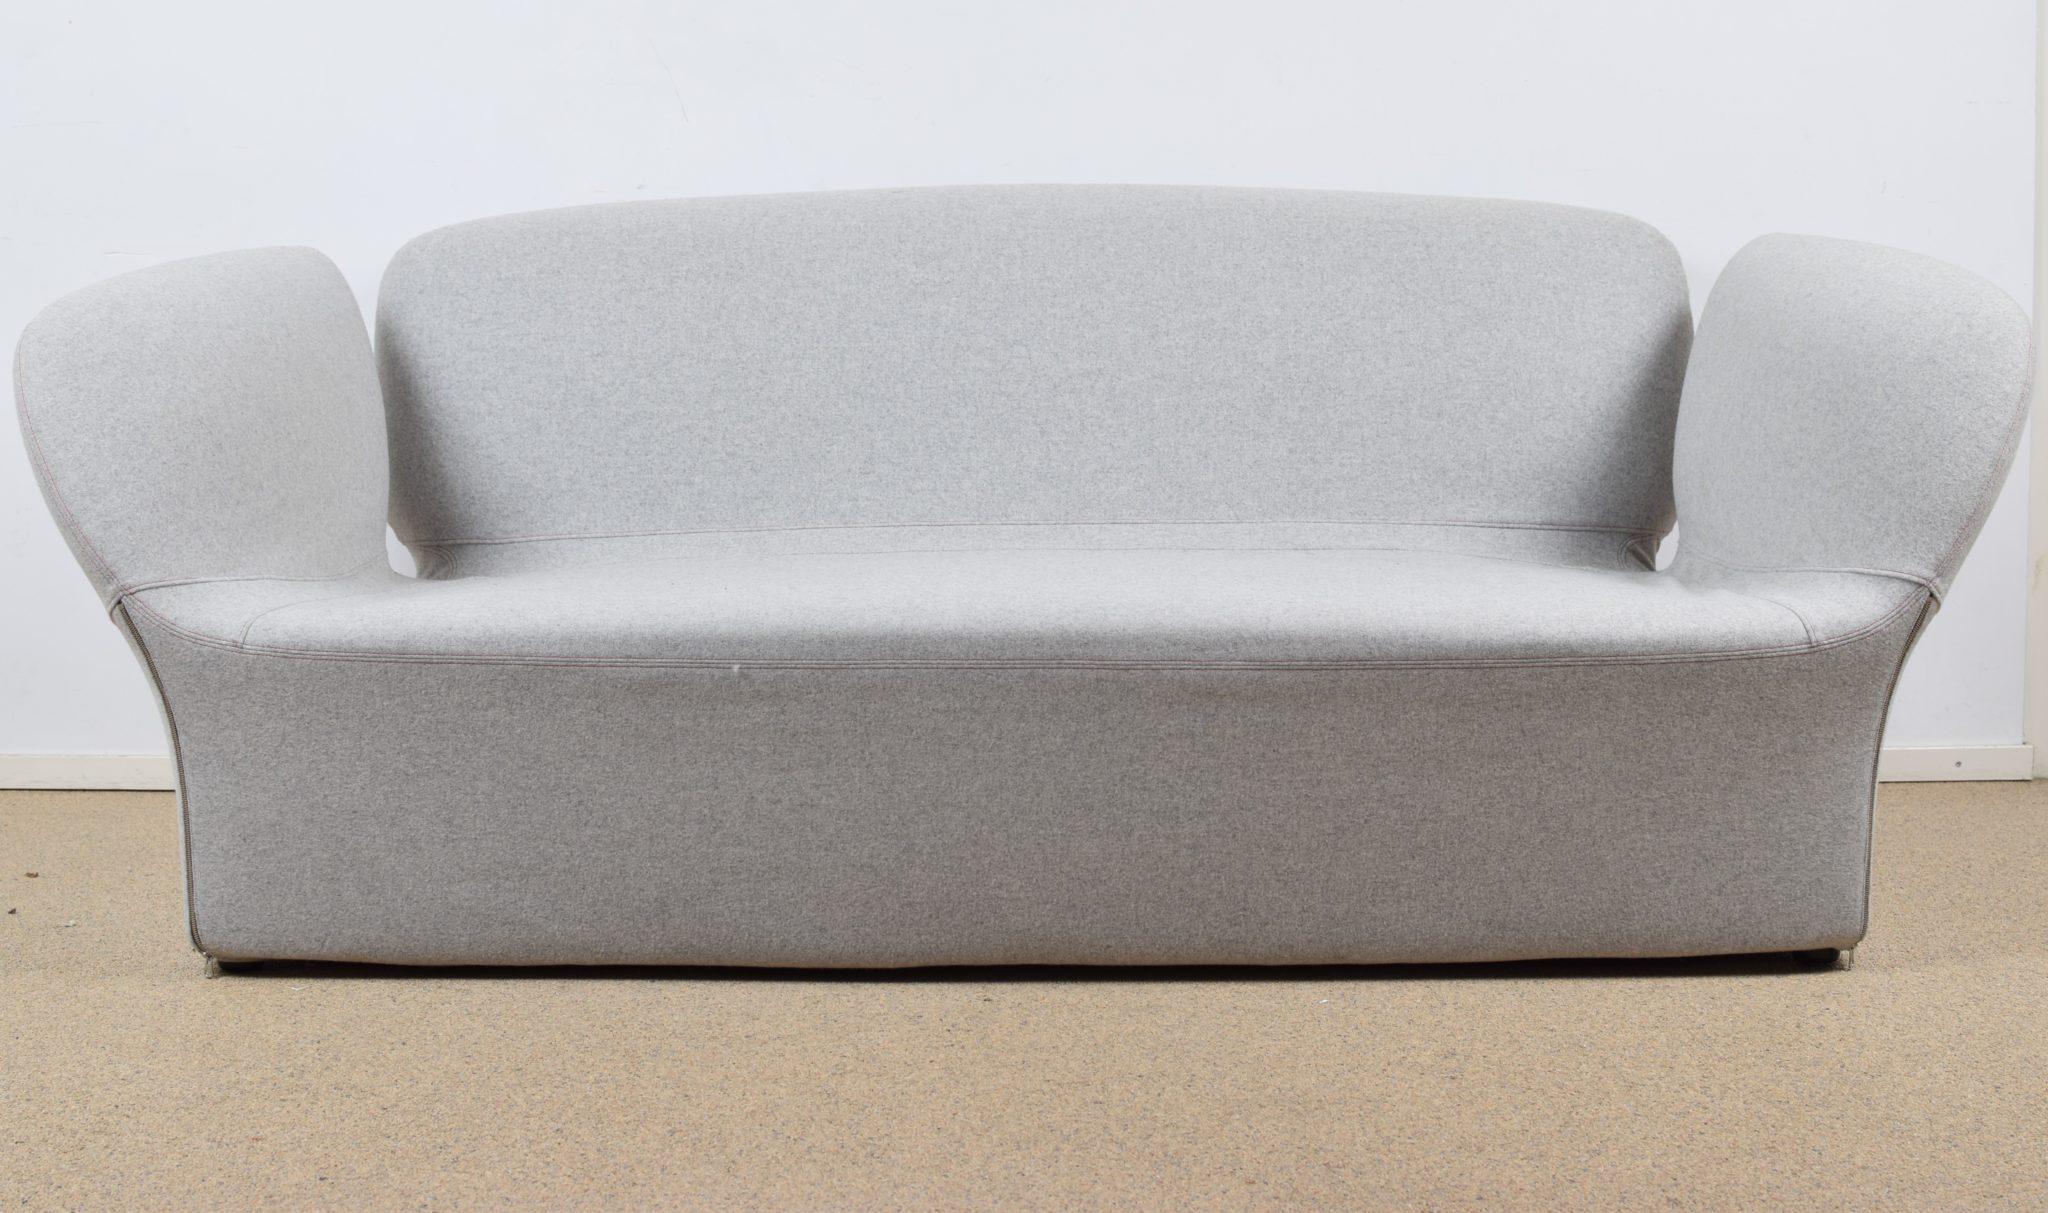 Miraculous Bloomy Major 2 Seater Sofa By Patricia Urquiola Howaboutout Vintage Furniture Interior Design Ideas Skatsoteloinfo